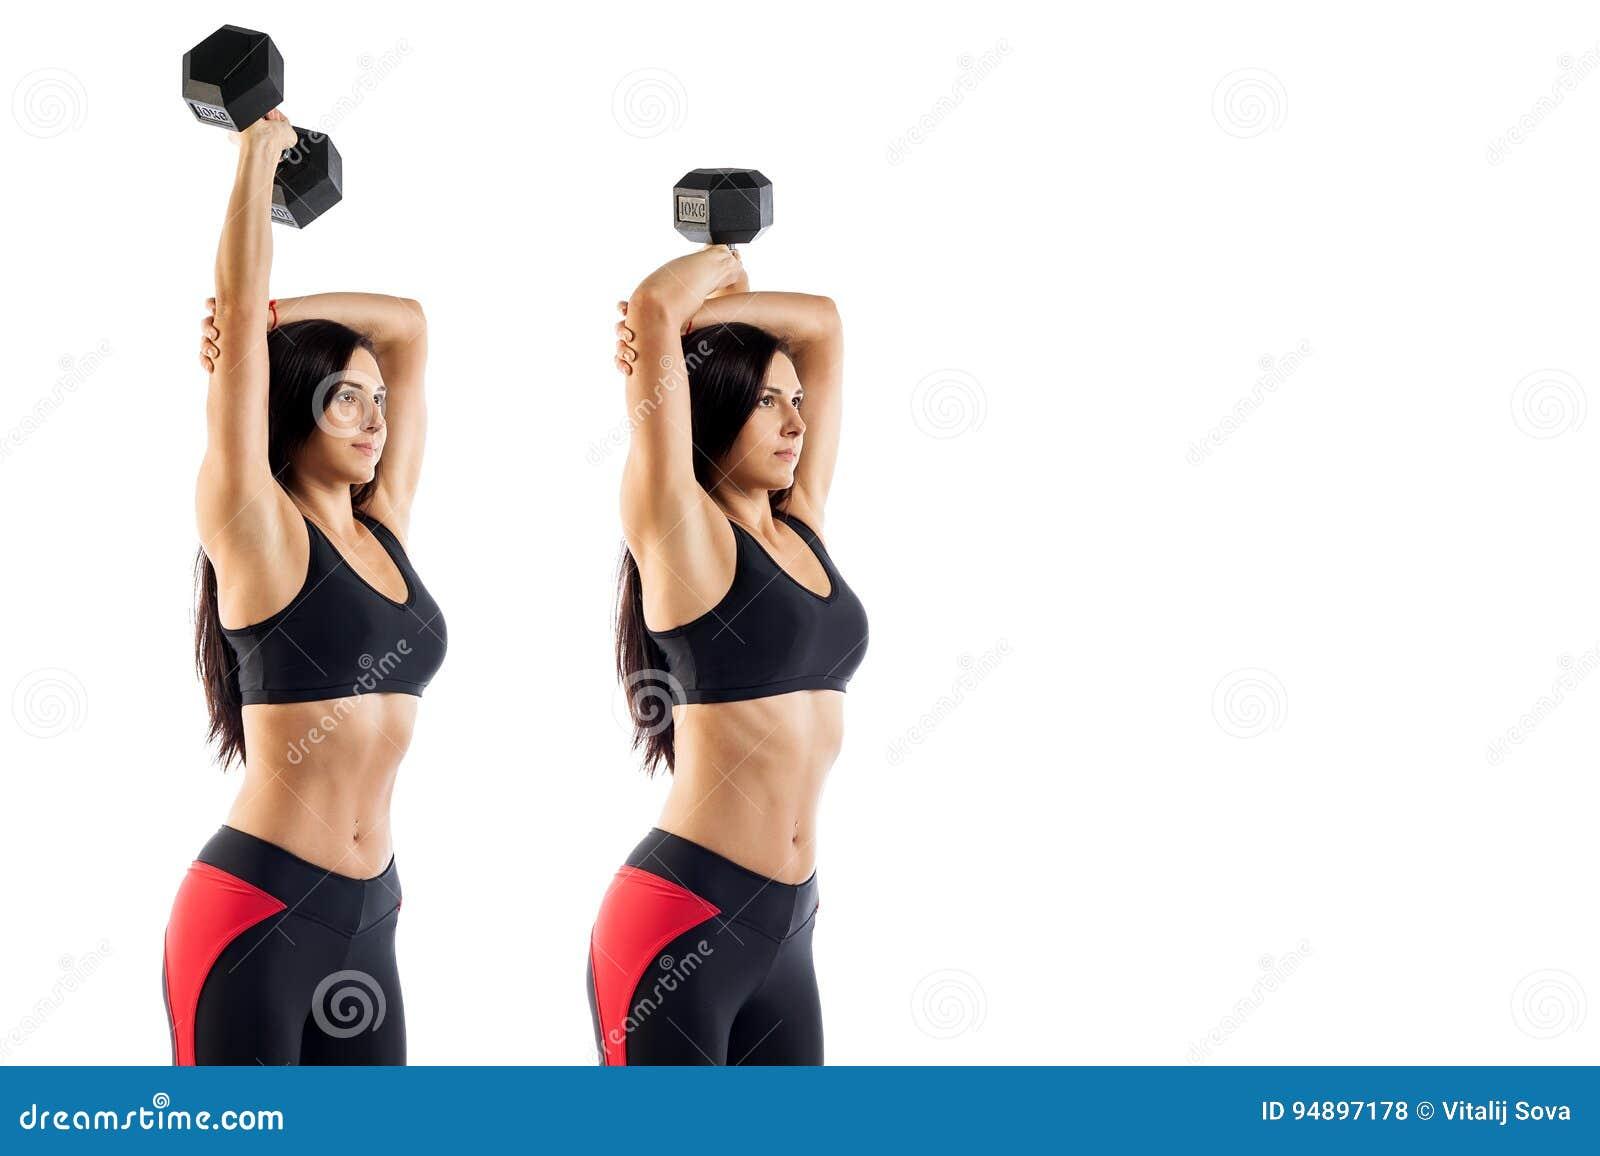 Ejercicios para biceps gym mujeres